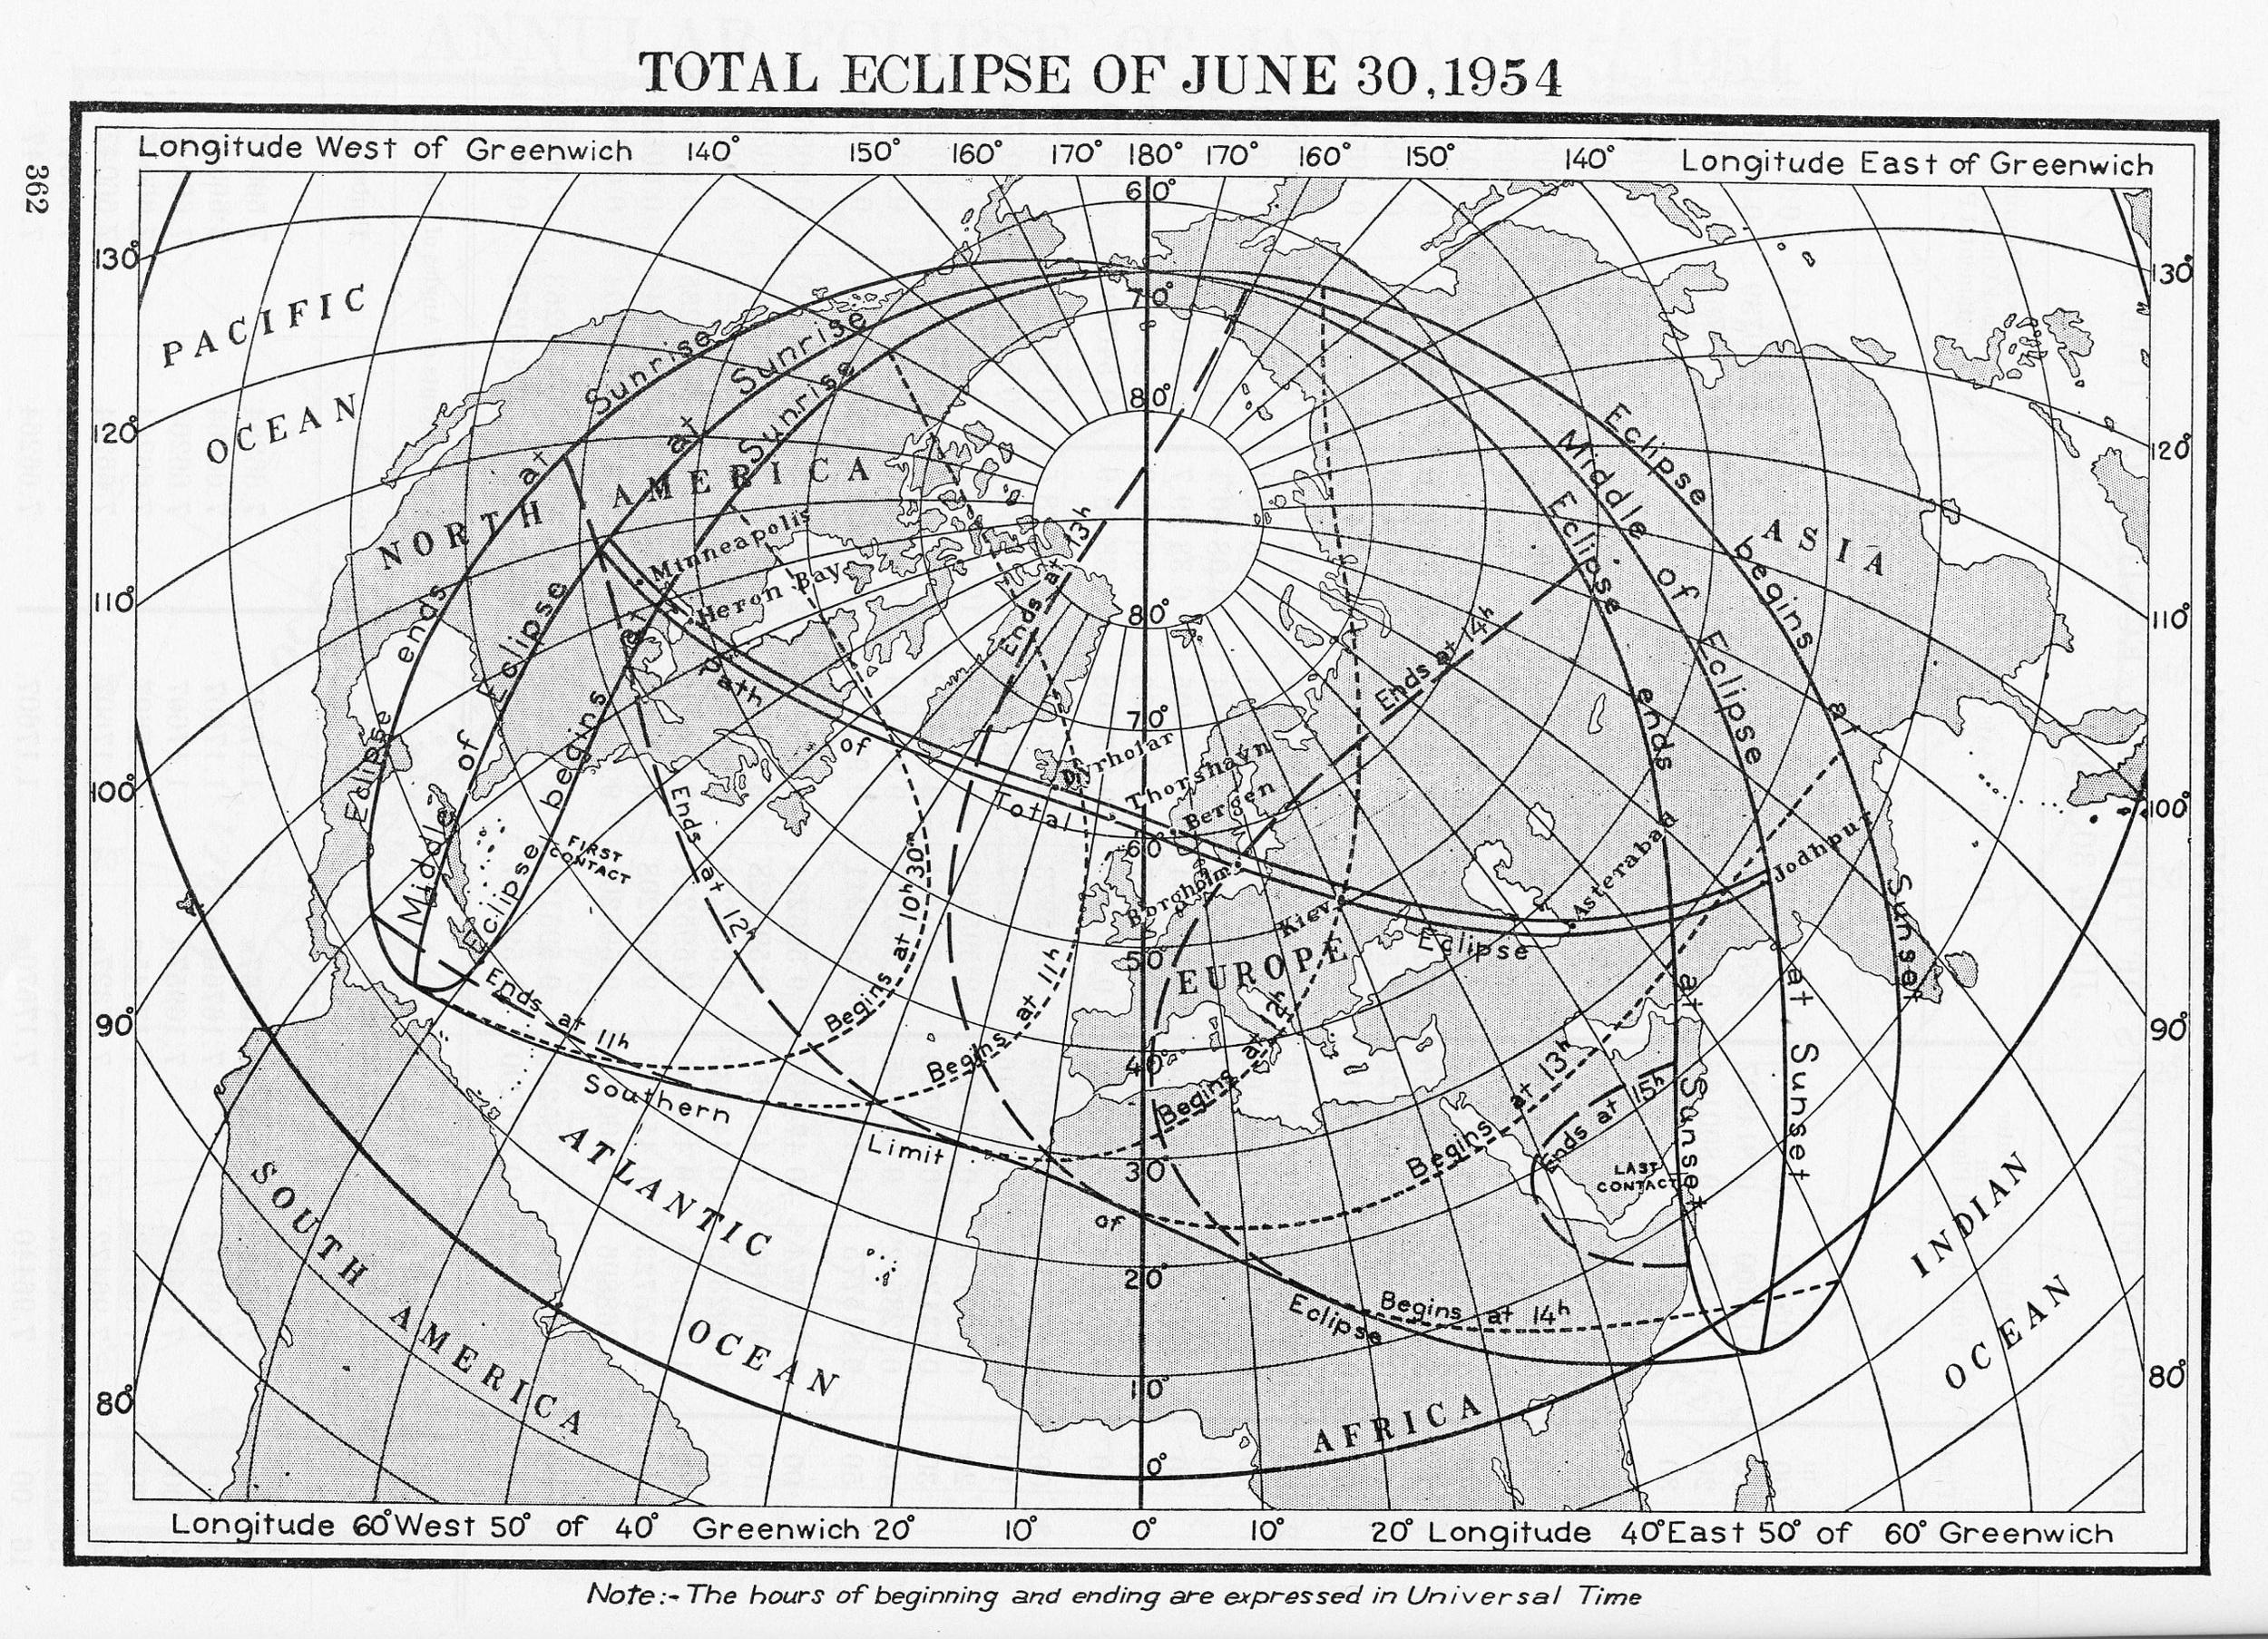 1954_June_30_TSE_American_Ephemeris_And_Nautical_Almanac.jpg